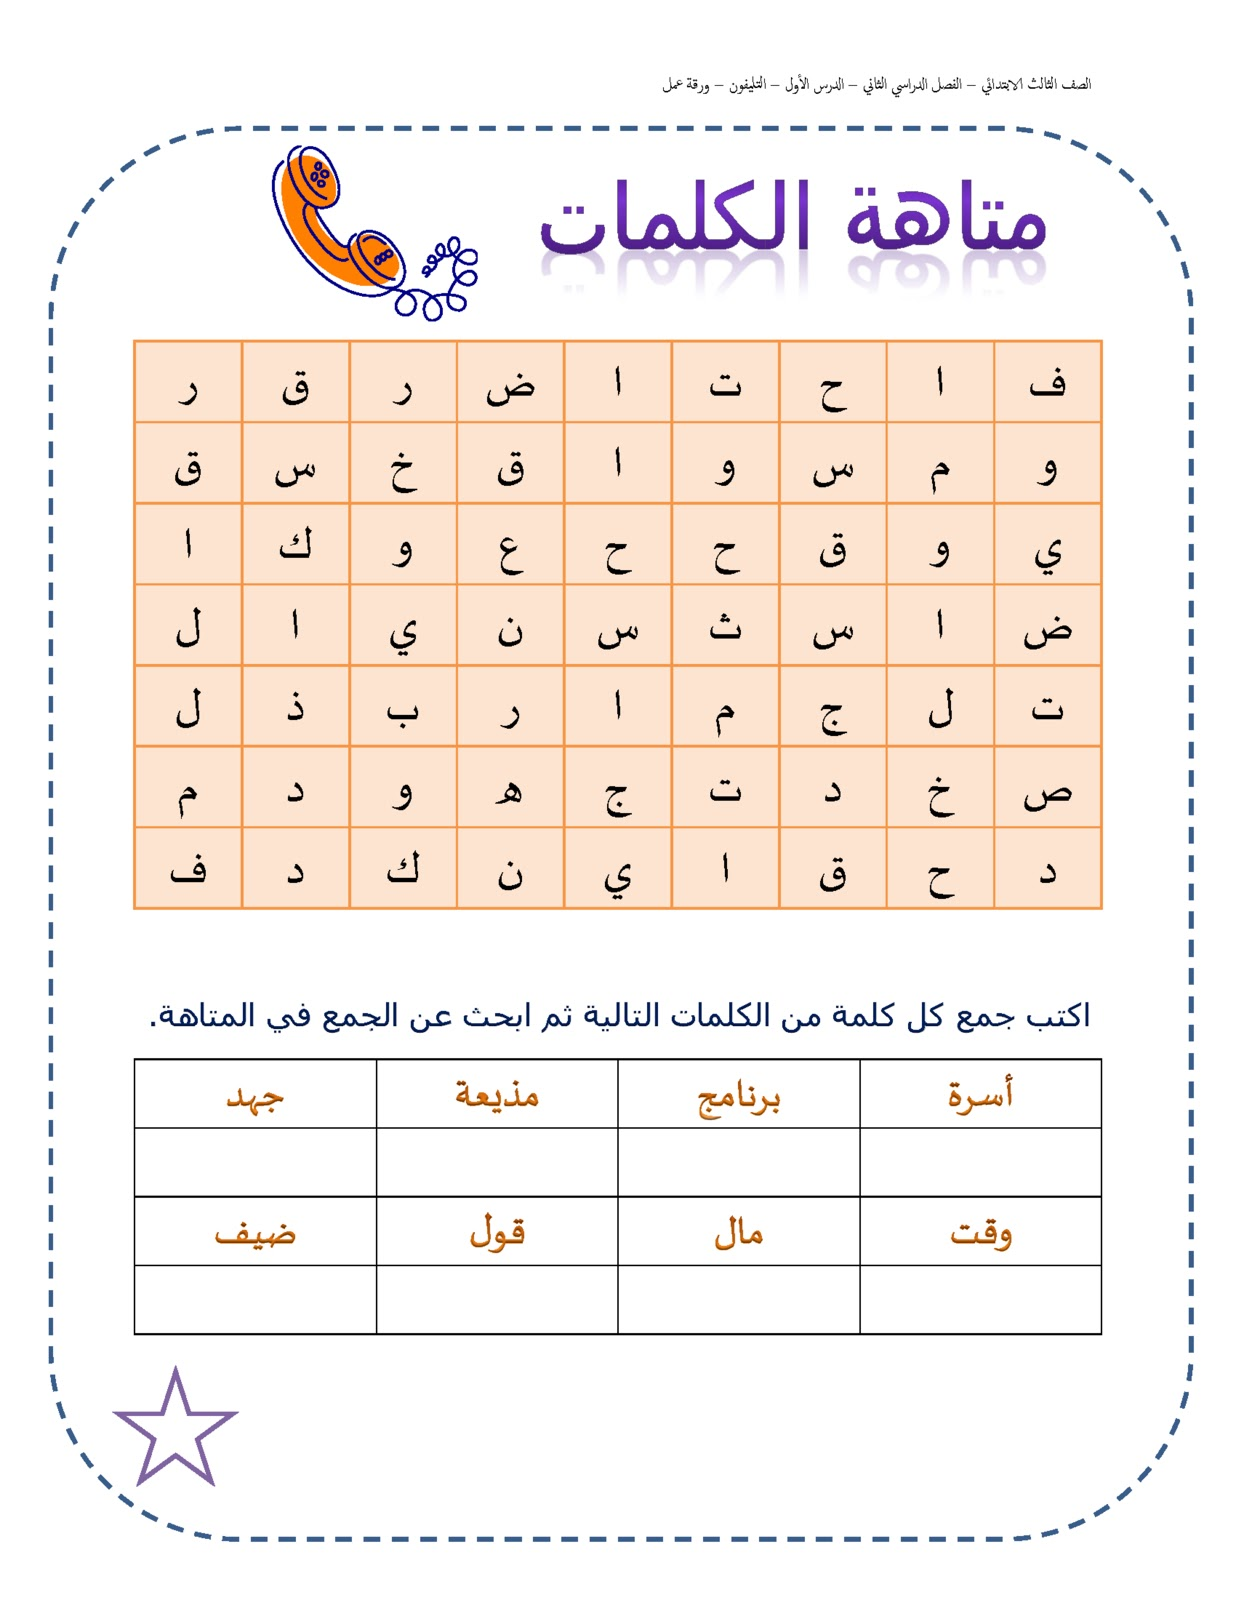 nermeen 39 s blog arabic worksheets egyptian curriculum. Black Bedroom Furniture Sets. Home Design Ideas